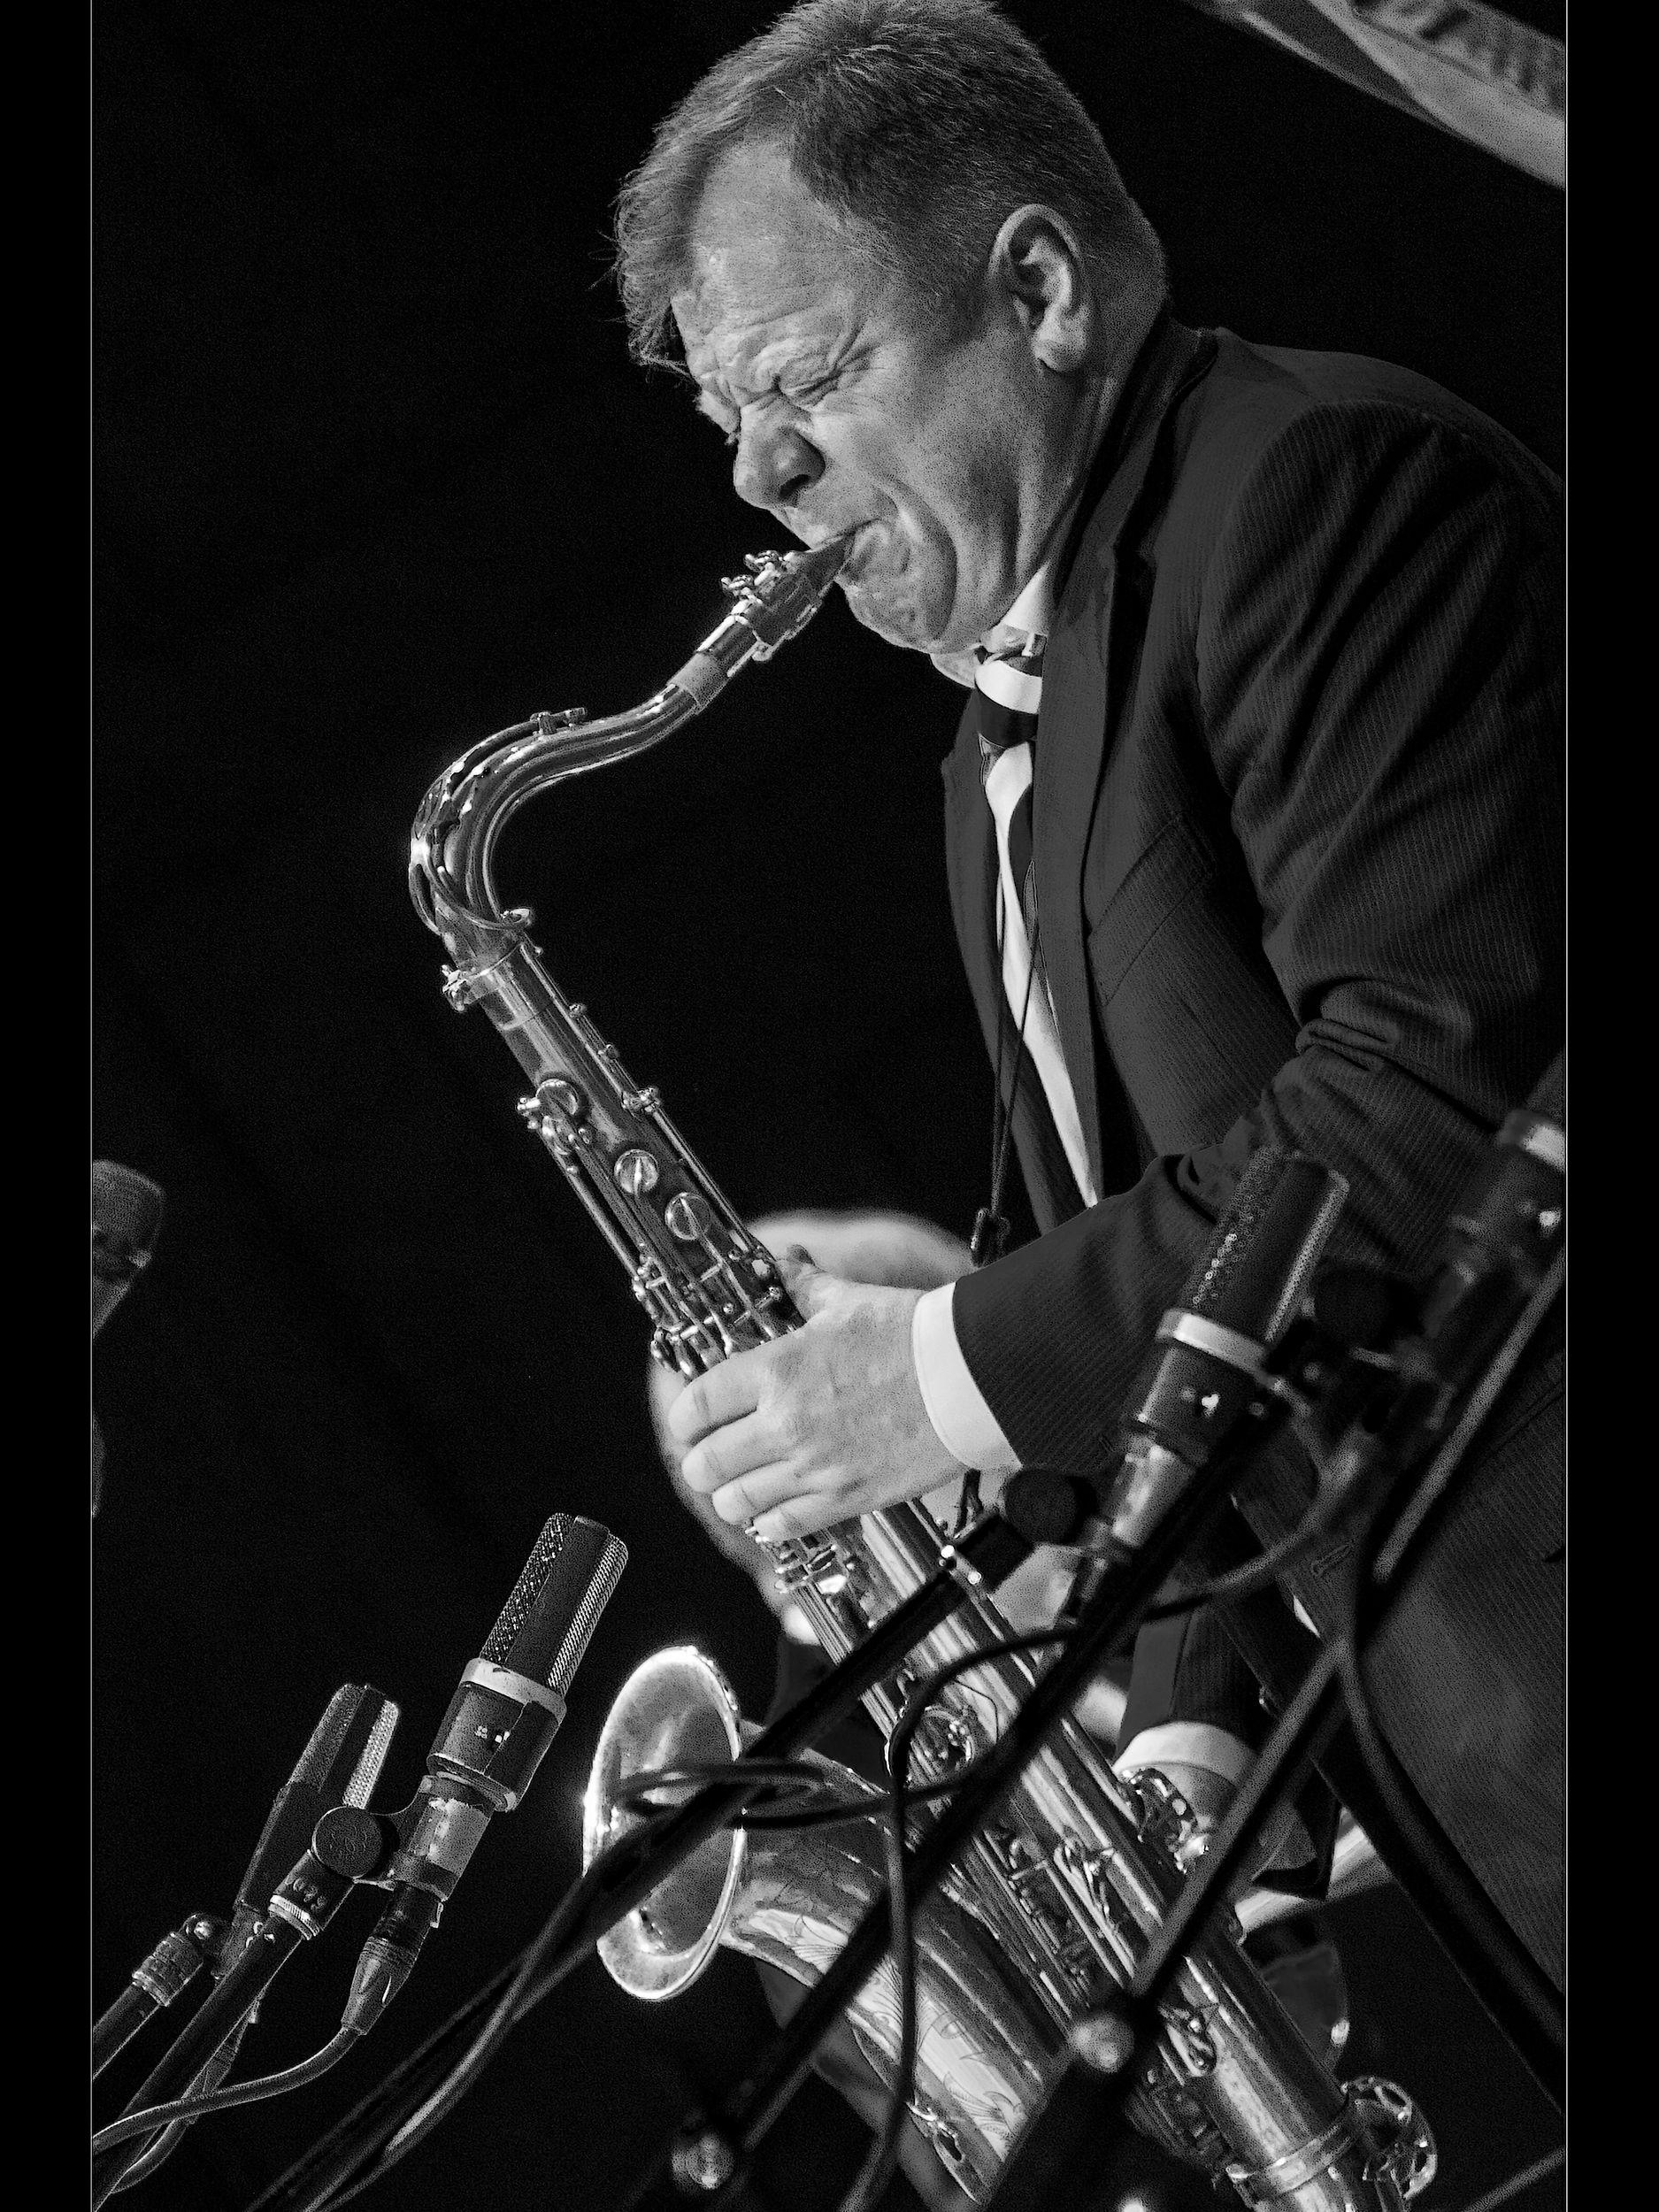 саксофон, бутман, джаз, концерт, музыка, saxophon, music, jazz, show, butman, Школдин Алексей